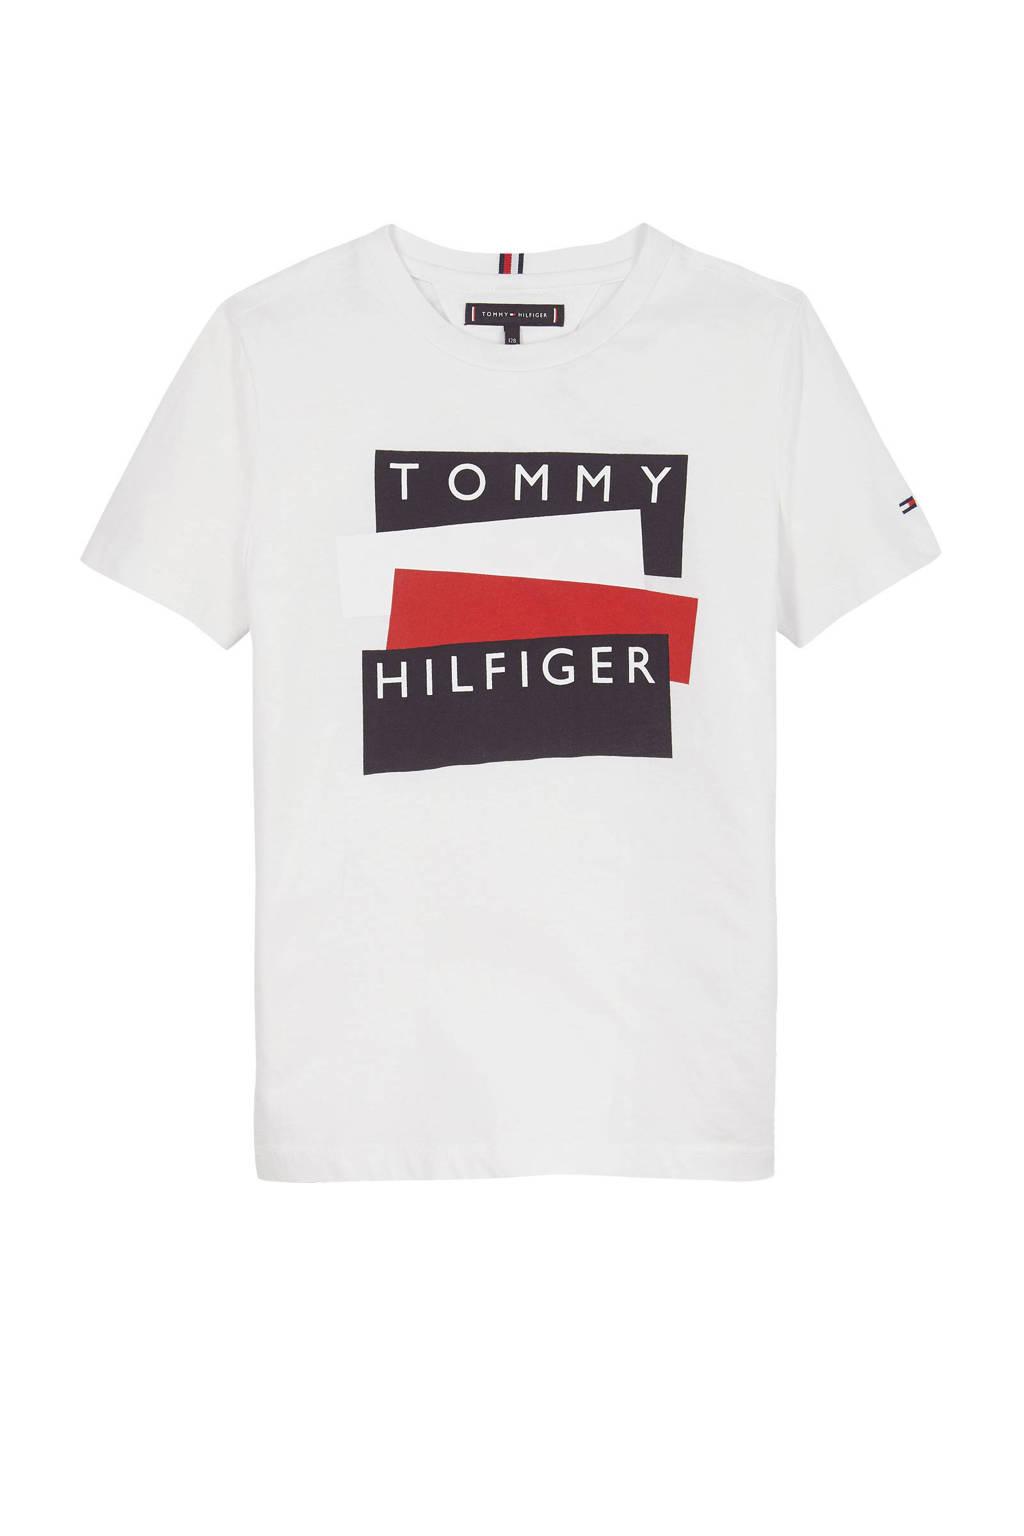 Tommy Hilfiger T-shirt met logo wit, Wit